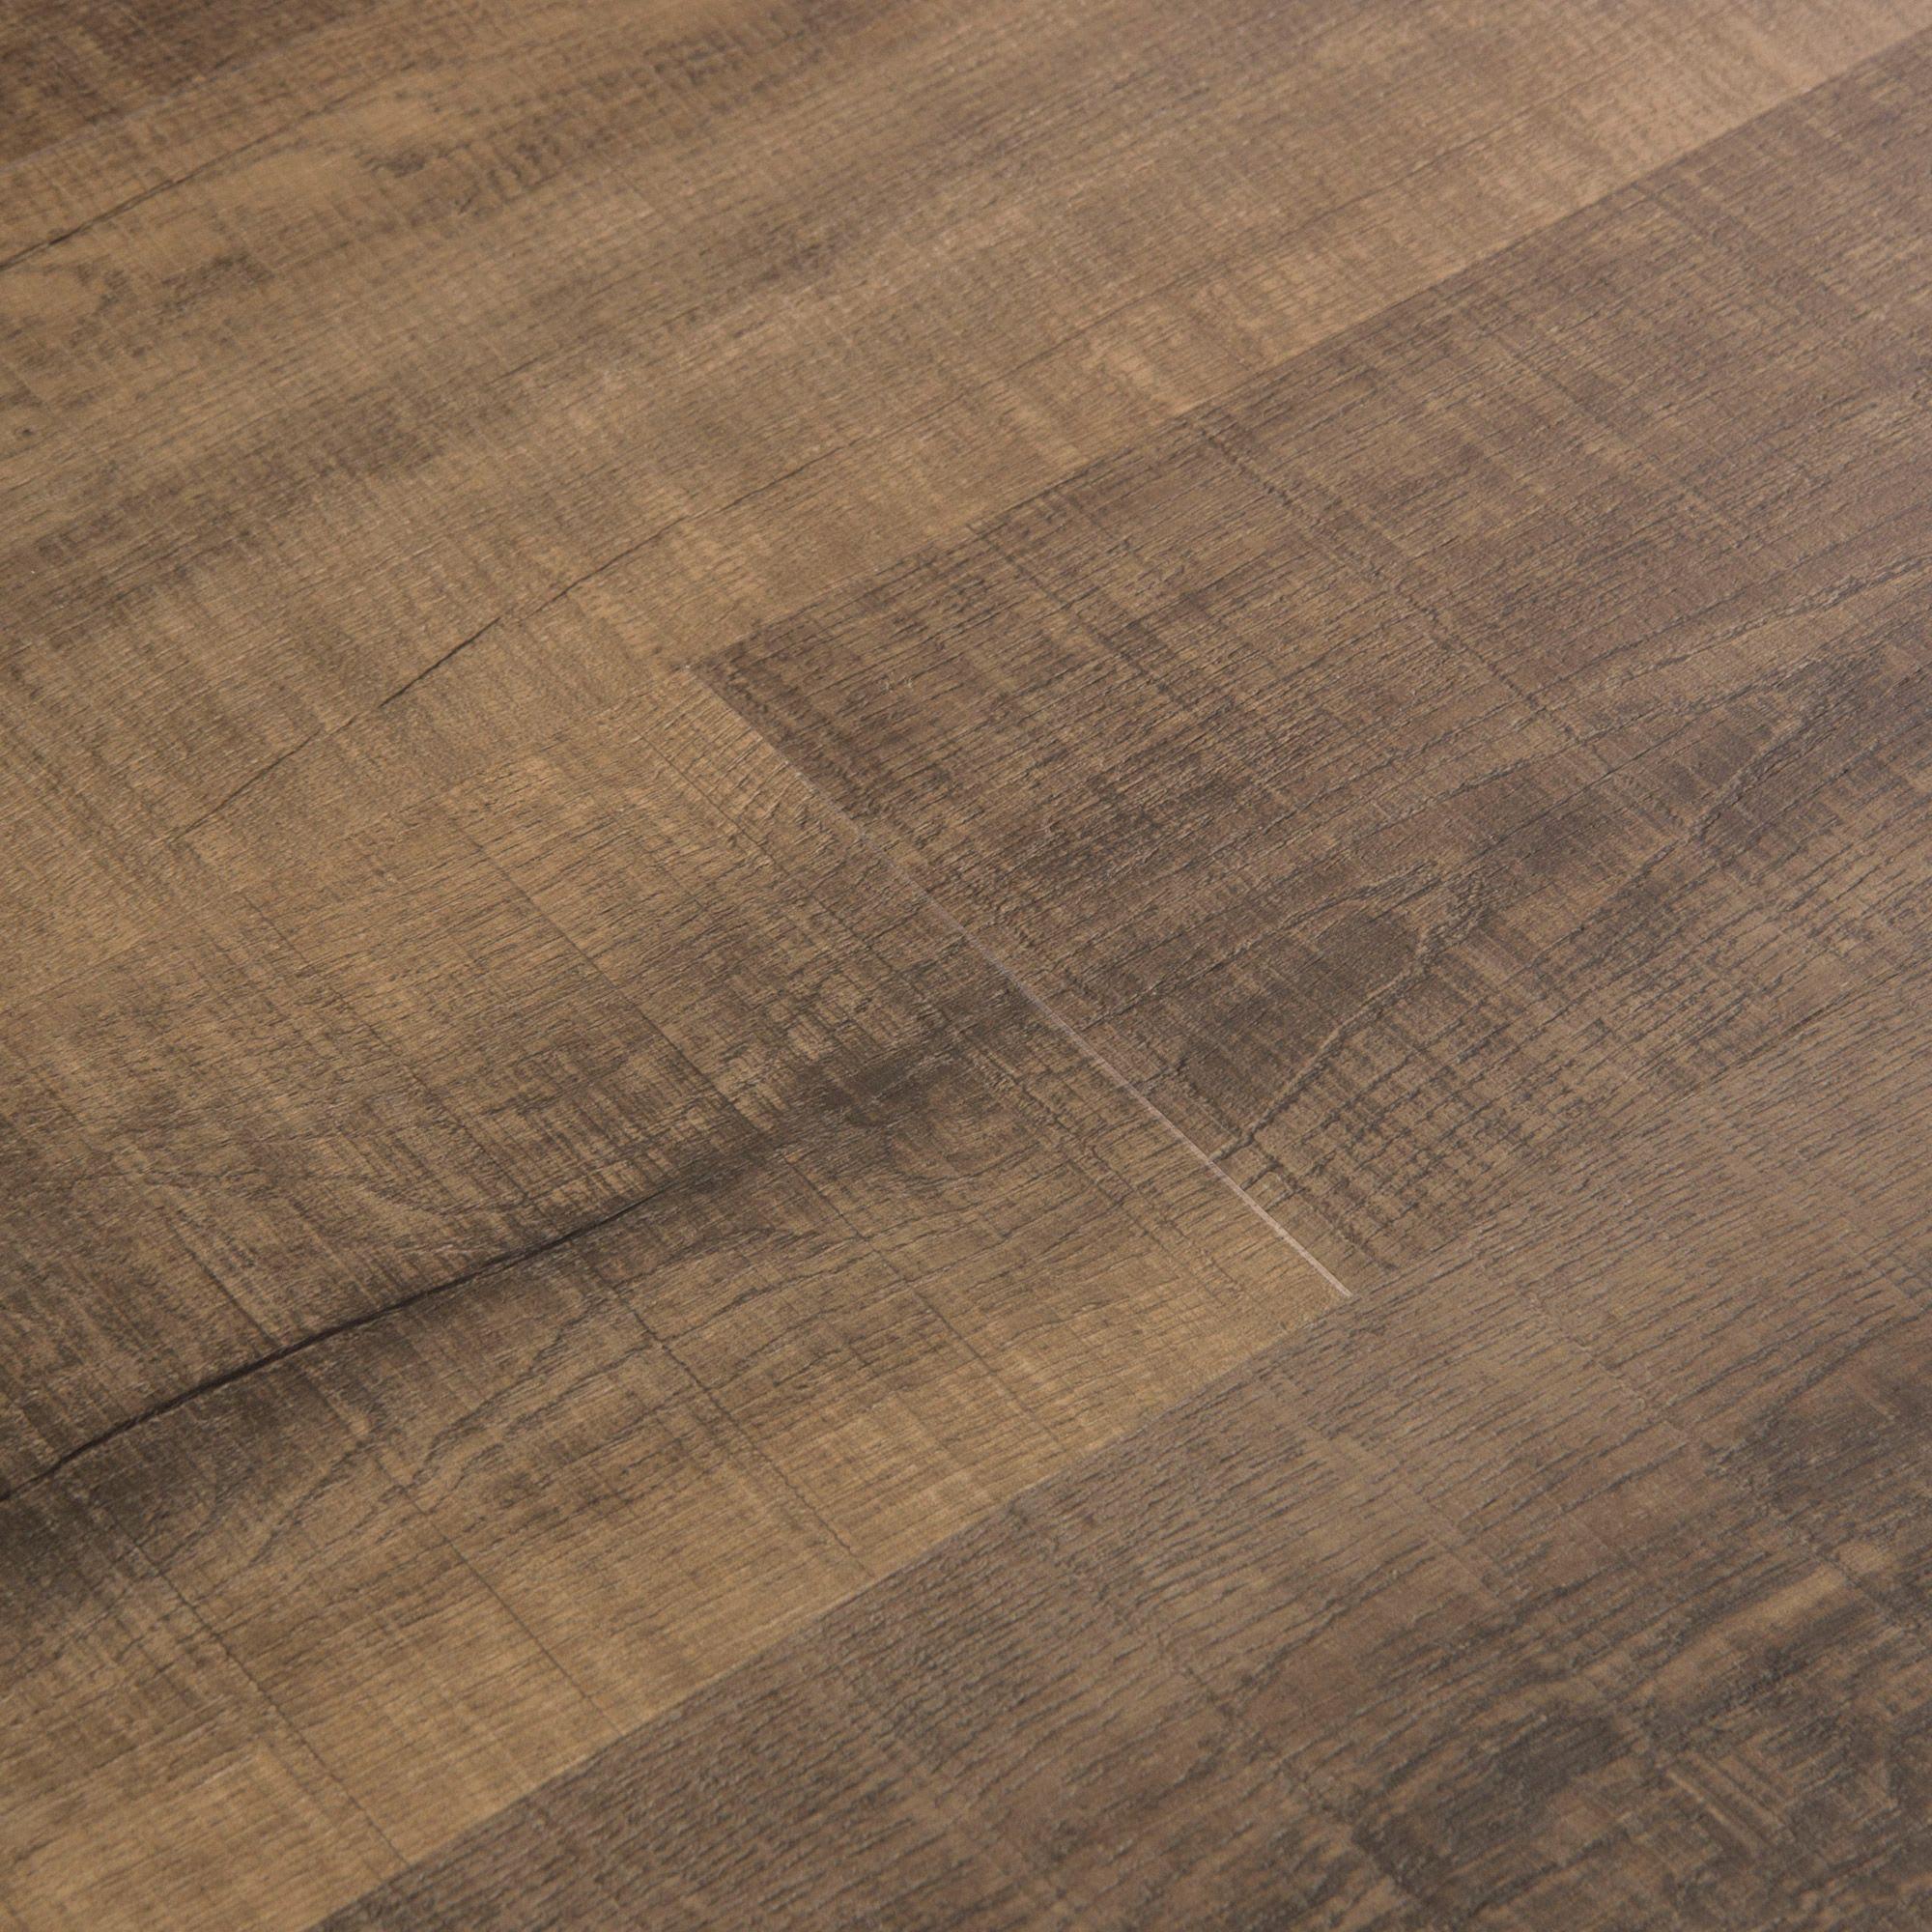 Cali Vinyl Monterey Pro Wide And Click Vinyl Plank Flooring 23 77